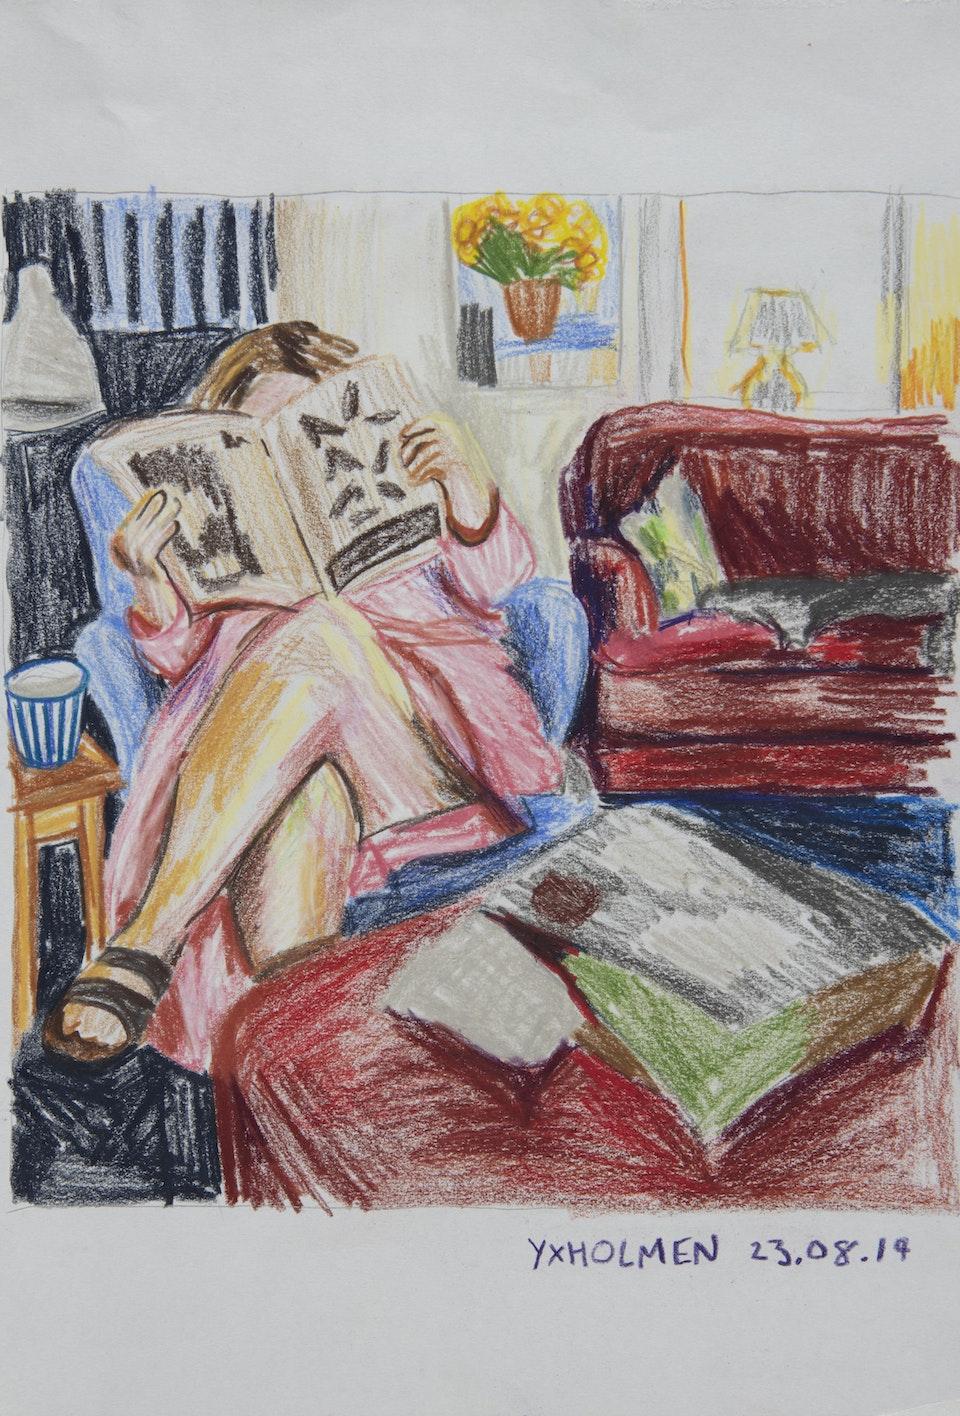 In Situ - Mormor Yxholmen -  2019 - Pencil on Paper - 21 x 30 cm